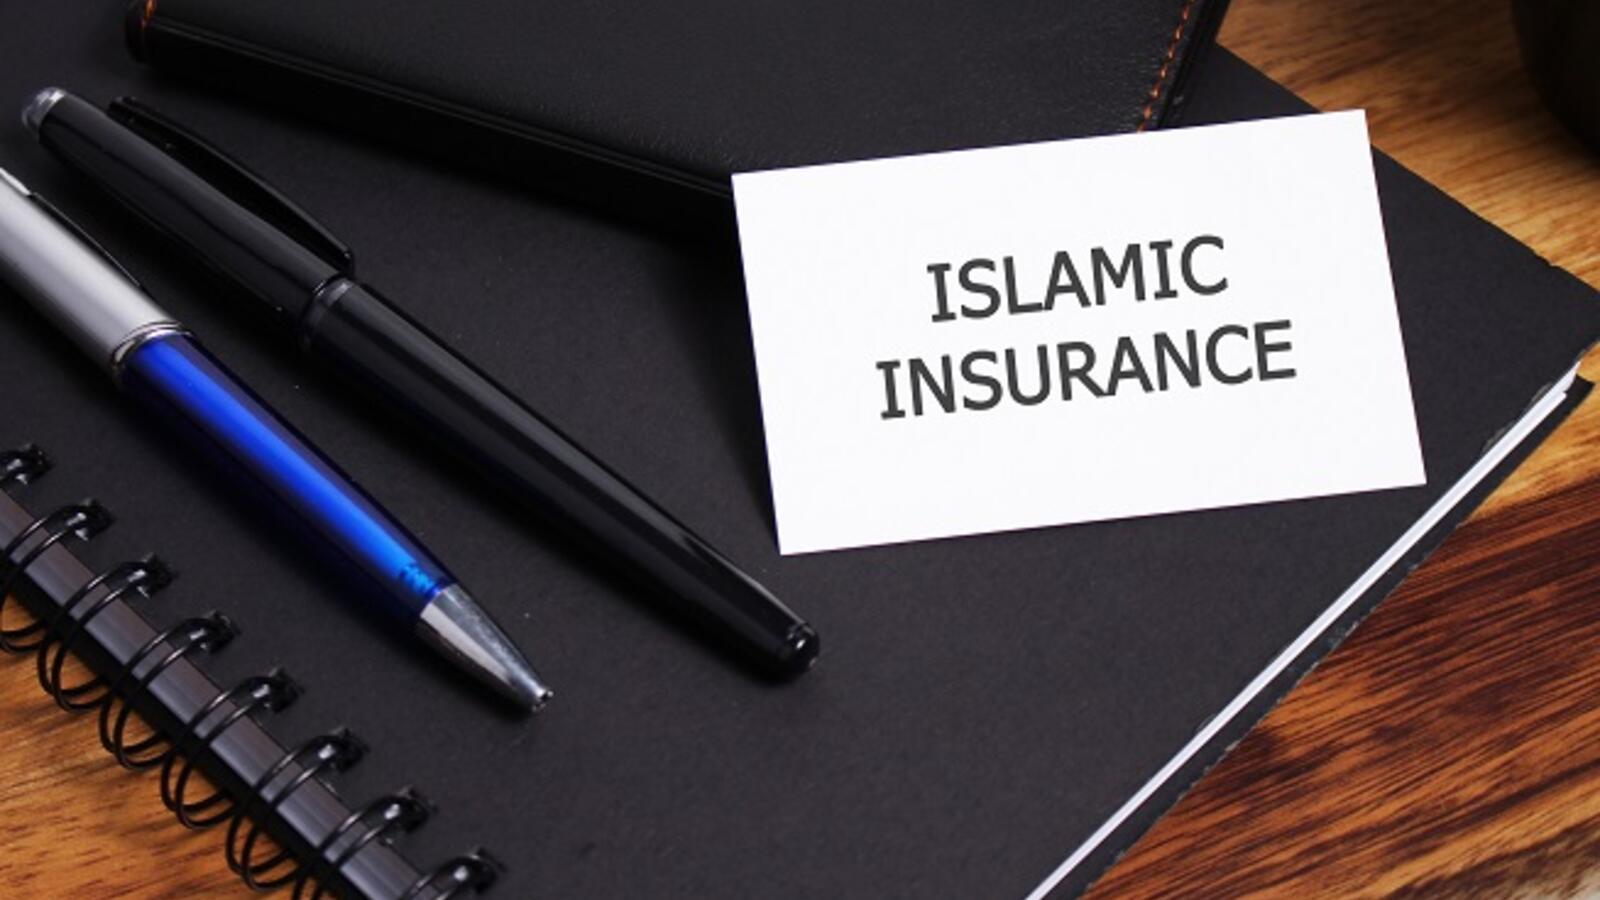 Hukum Asuransi dalam Islam, Bagaimana Kehalalannya?